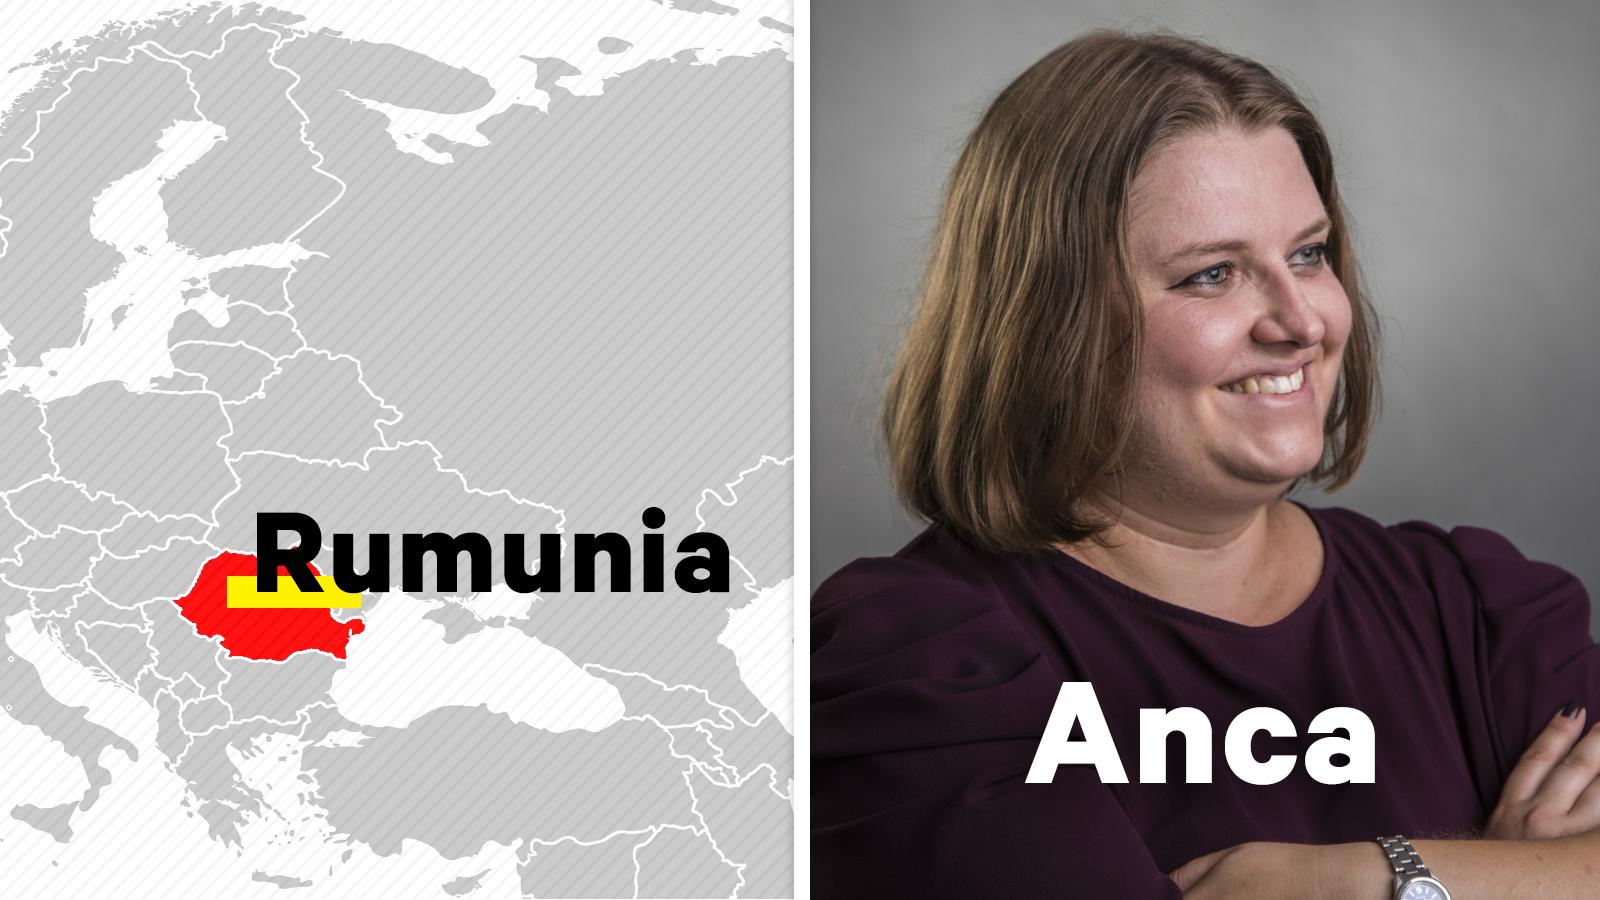 Anca Tudoricu (fot: materiały archiwalne)